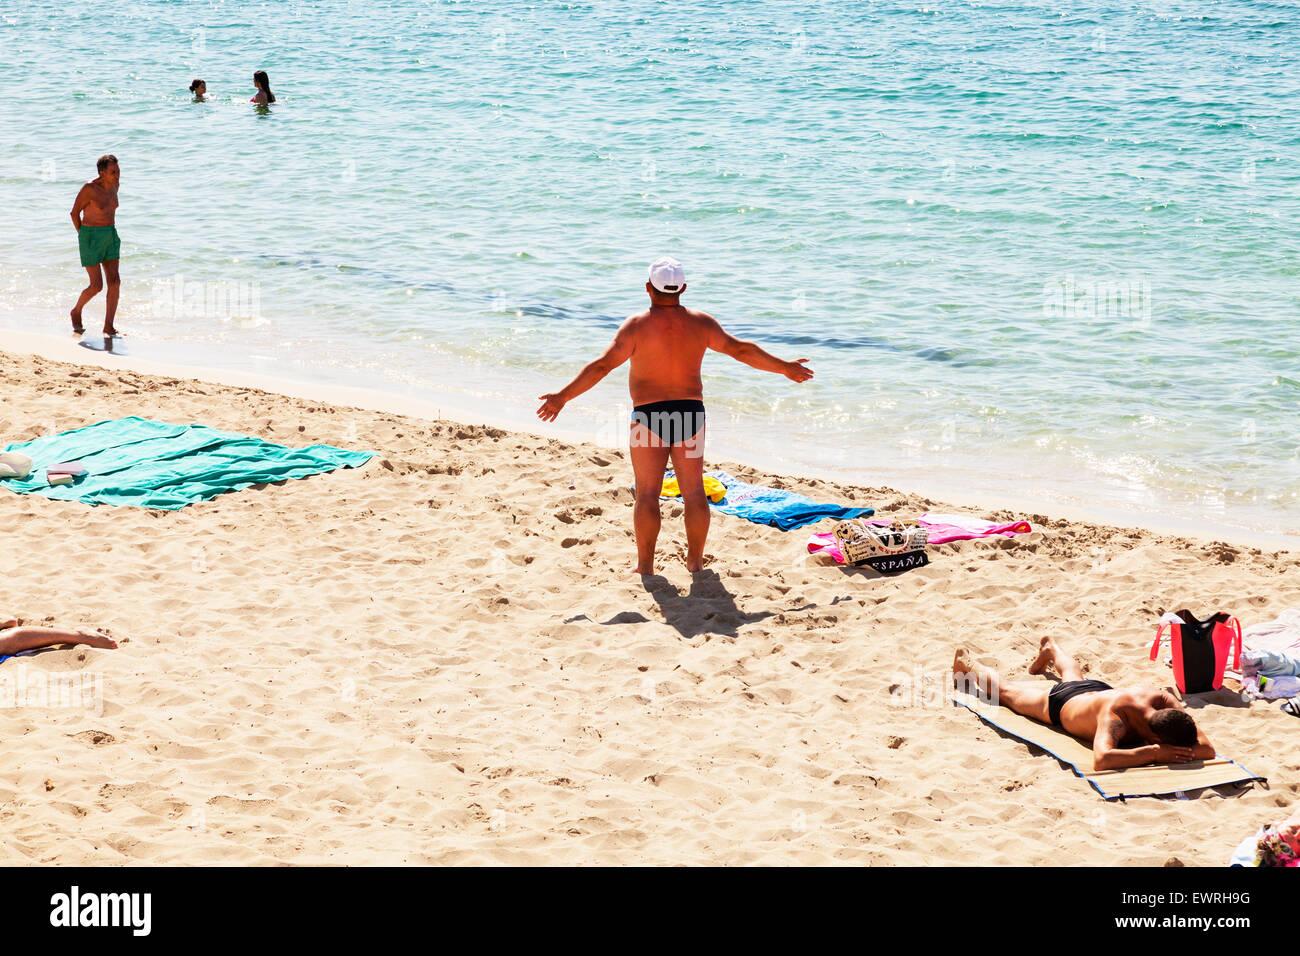 Sunbather sunbathing sun worshiper worshipper bather beach coast Santa Eulalia Del Rio Ibiza Spain Spanish resort - Stock Image